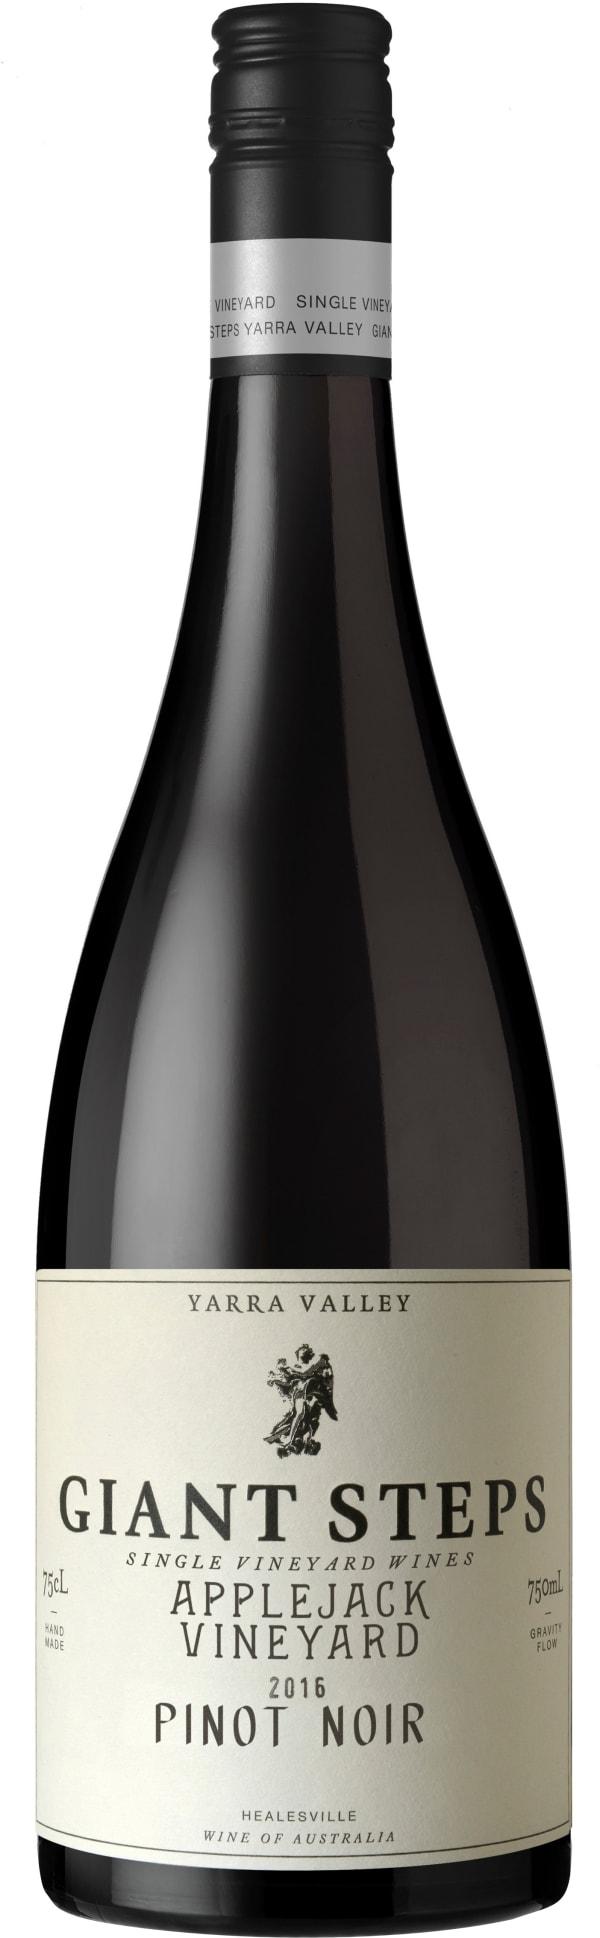 Giant Steps Applejack Vineyard Pinot Noir 2016